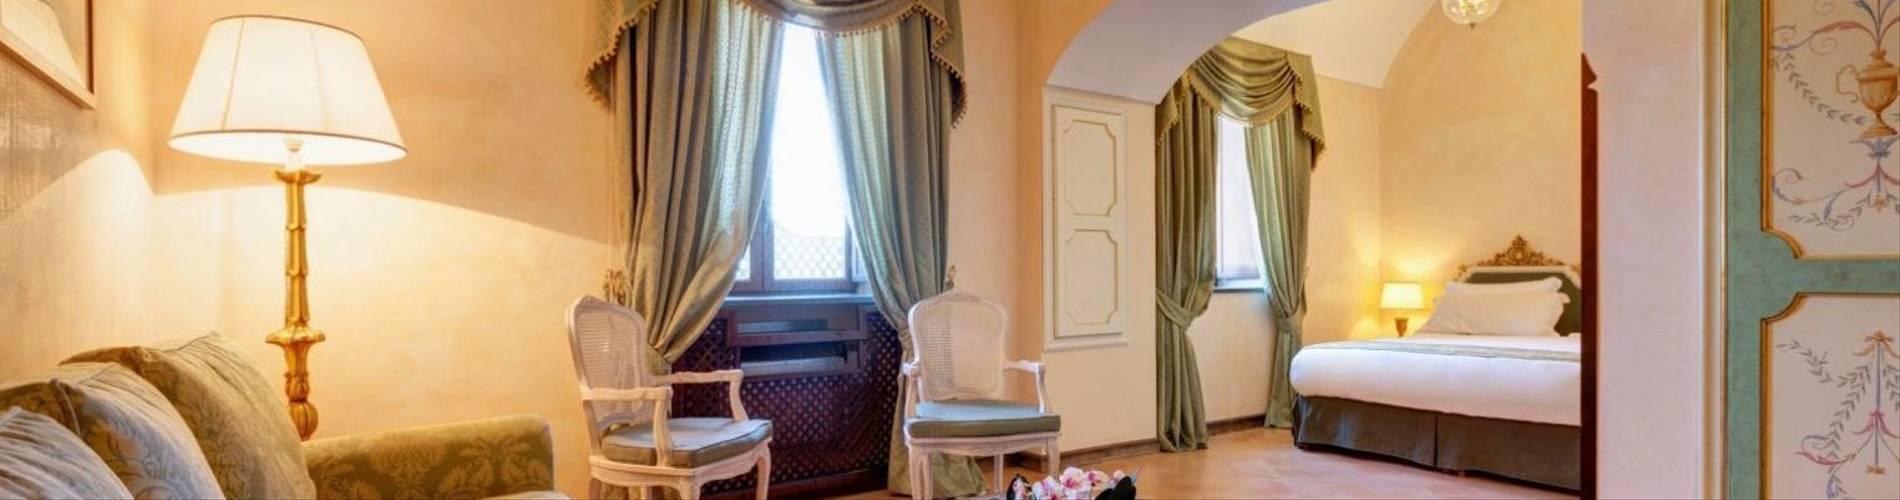 San Francesco Al Monte, Naples, Italy, Junior Suite.JPG